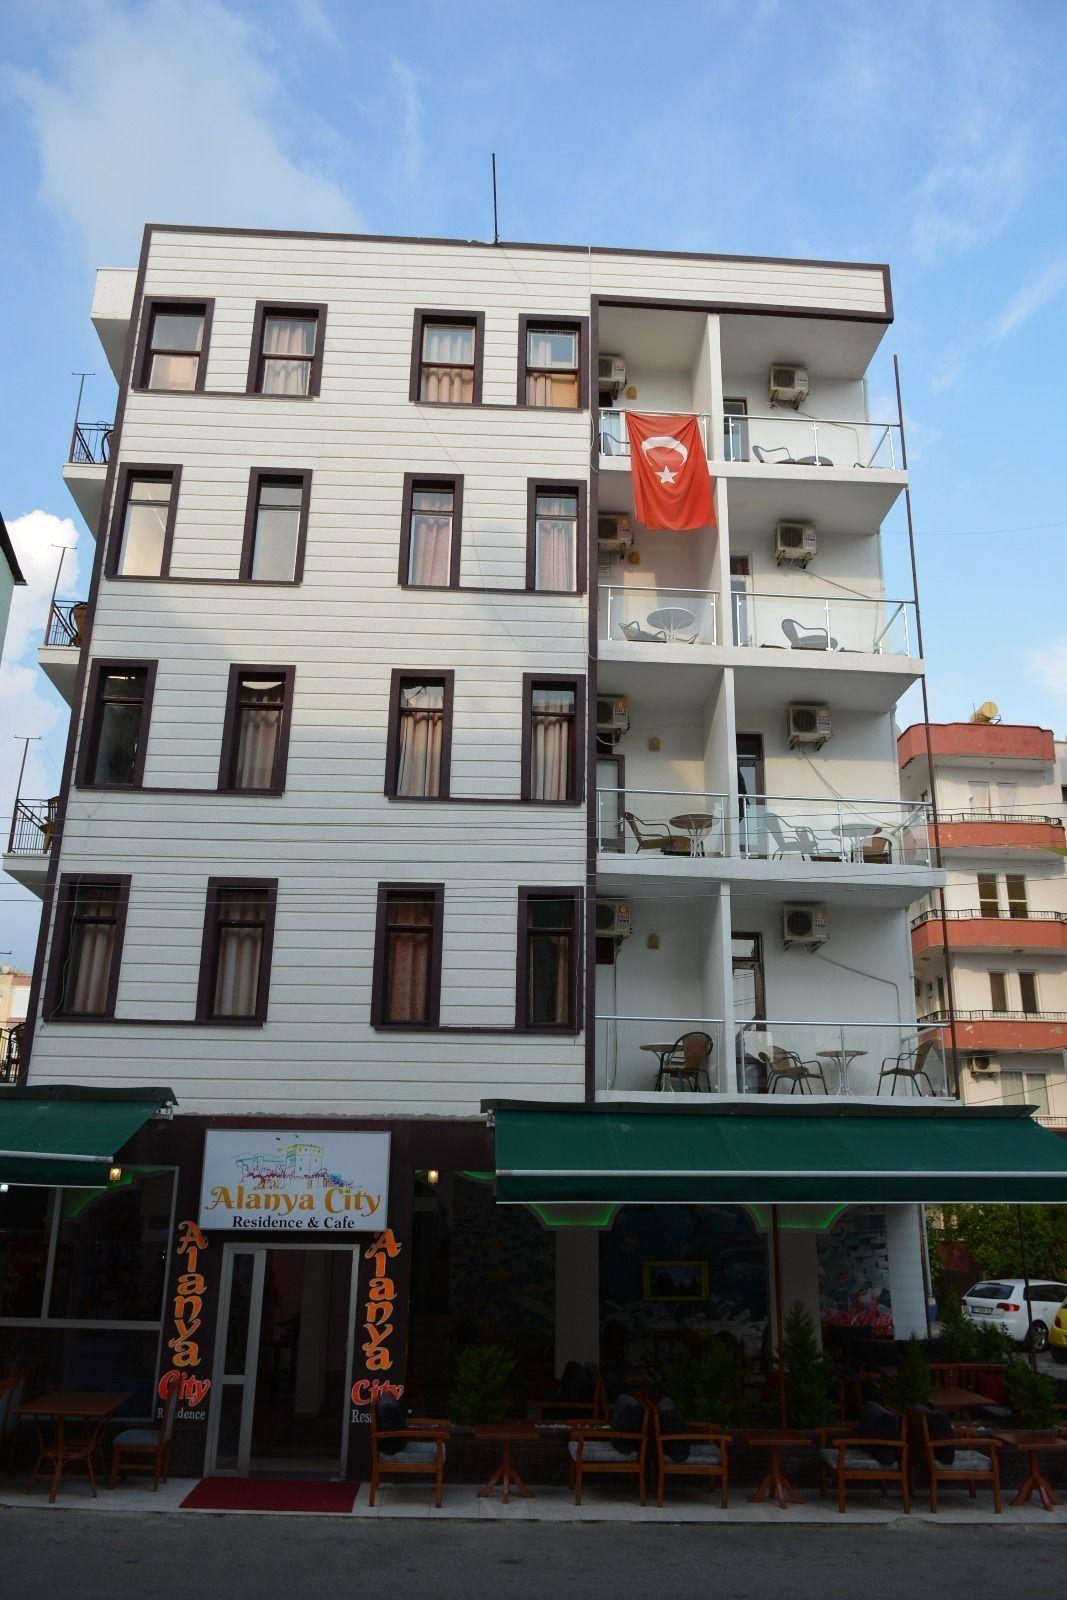 Alanya City Hotel And Residence